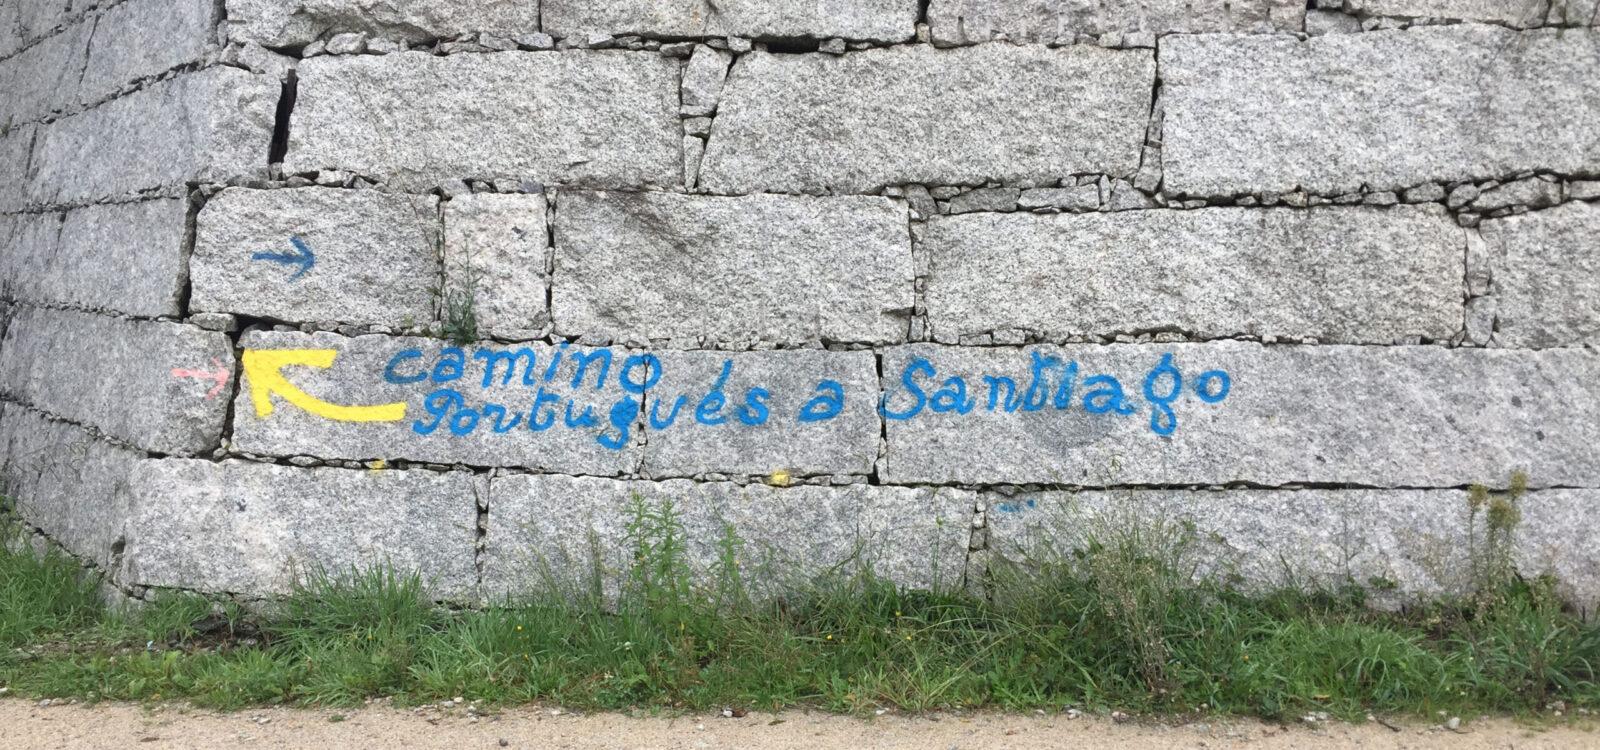 evia yoga reiki solingen jakobsweg camino pilgern steinwand mit spruehschrift camino portugues a santiago